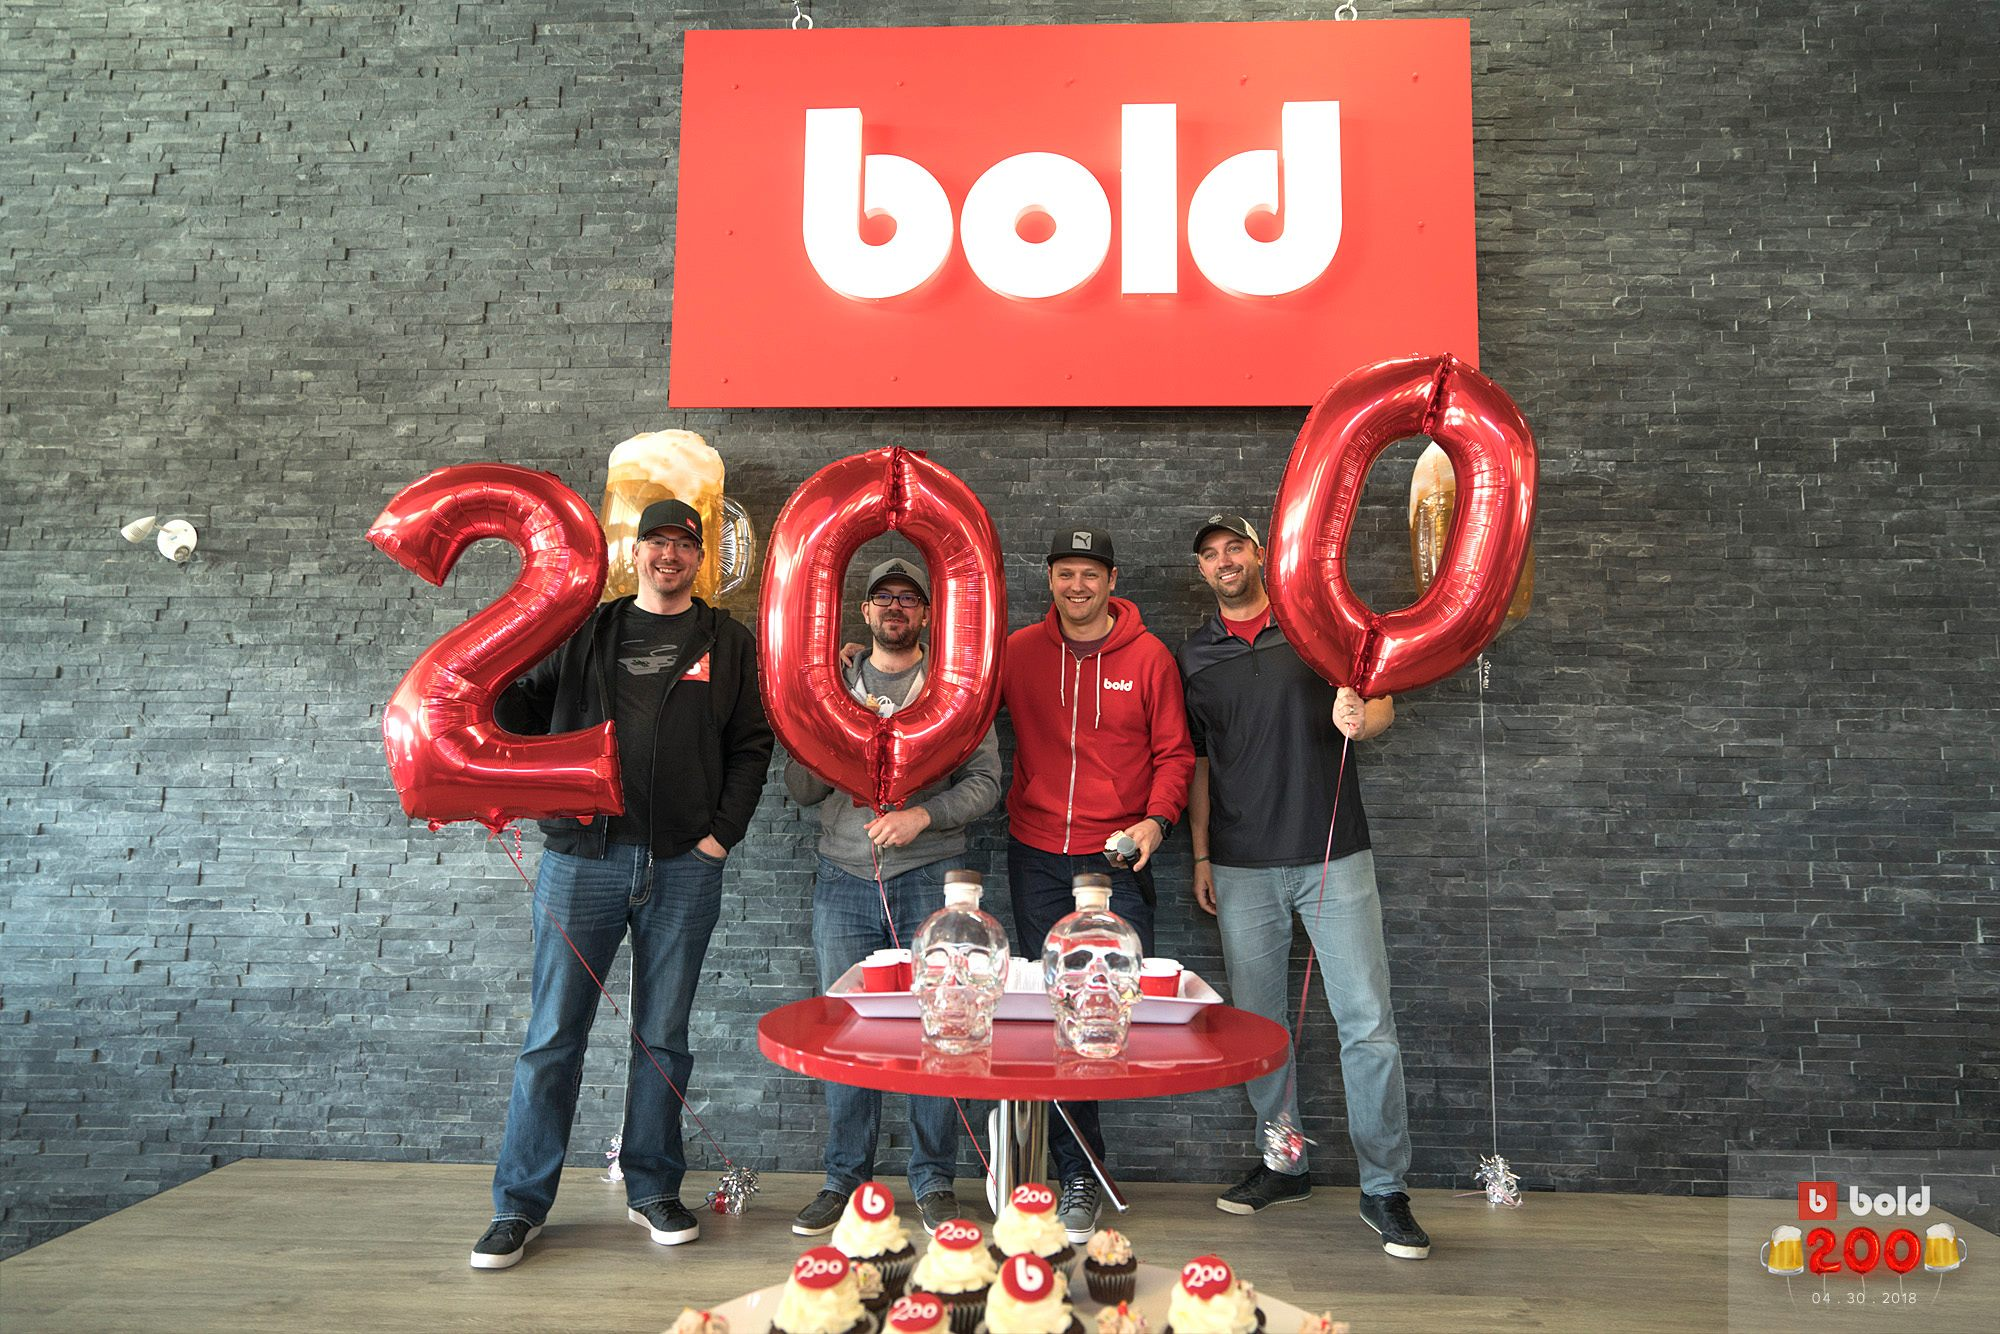 200th employee